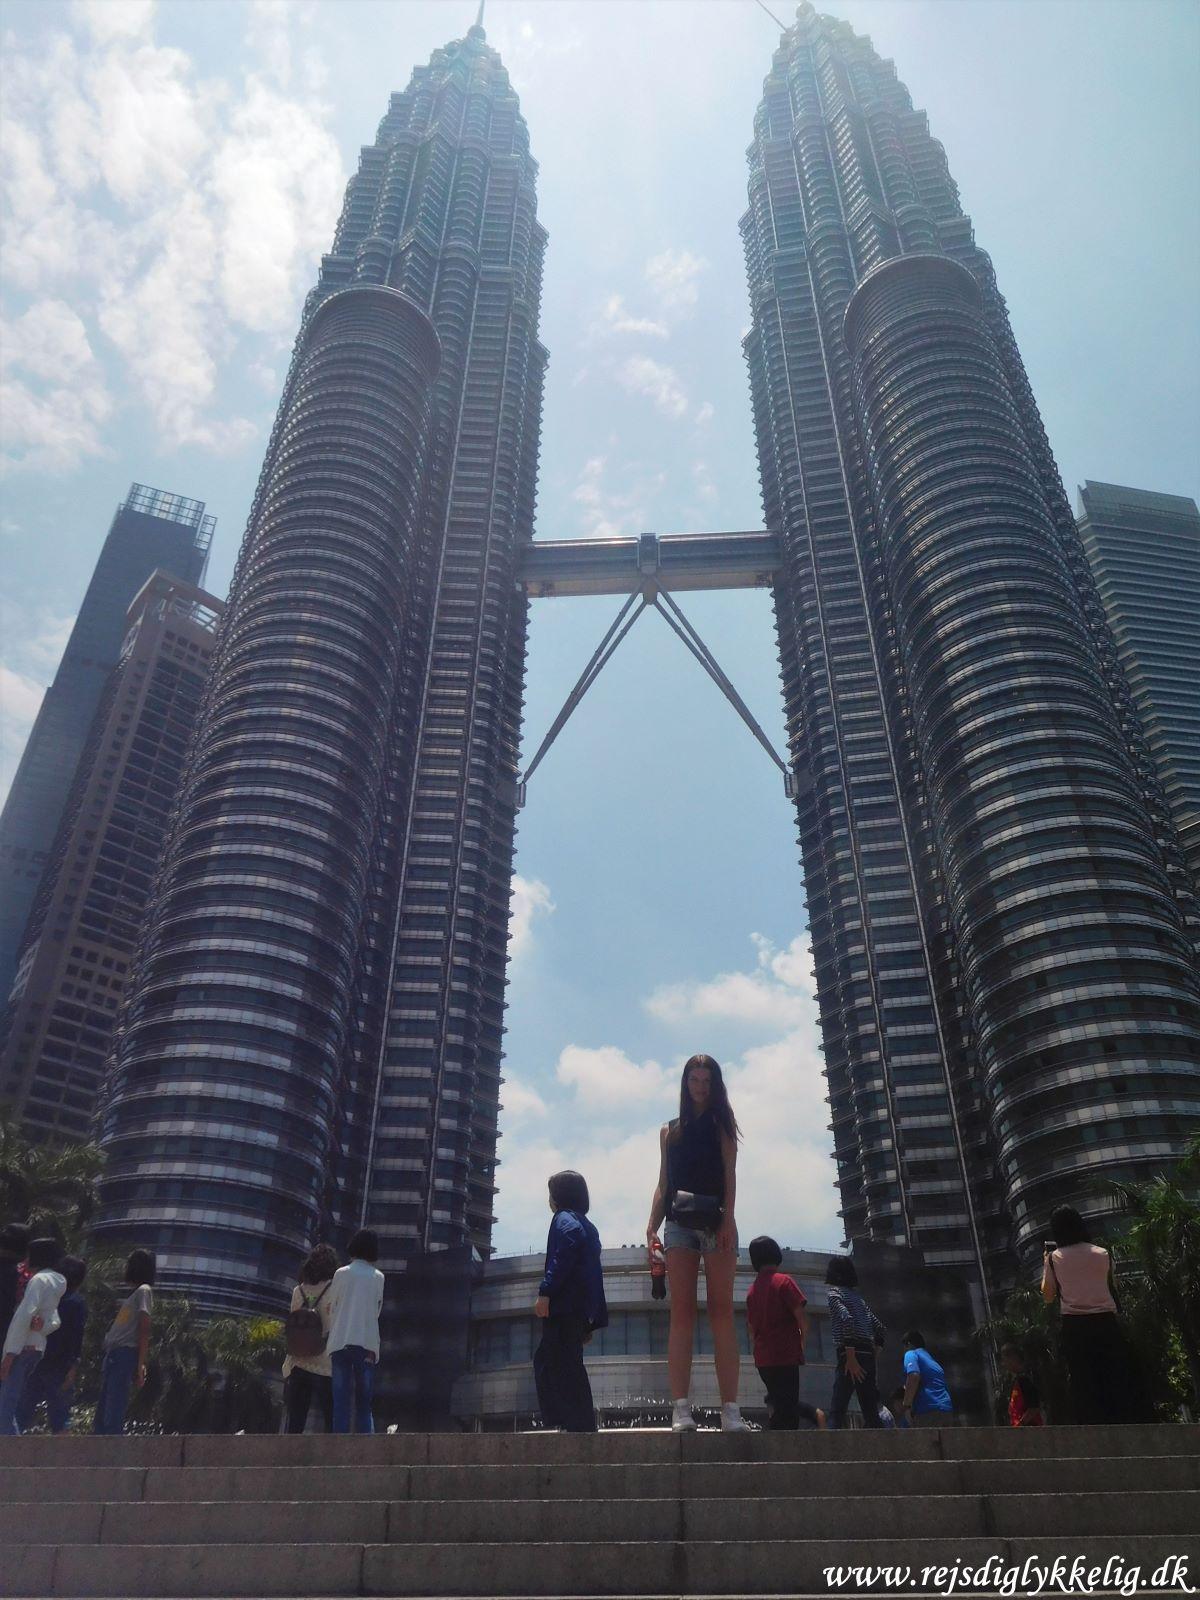 Tilbageblik på 2019 - Patronas Towers i Kuala Lumpur - Rejsdiglykkelig.dk